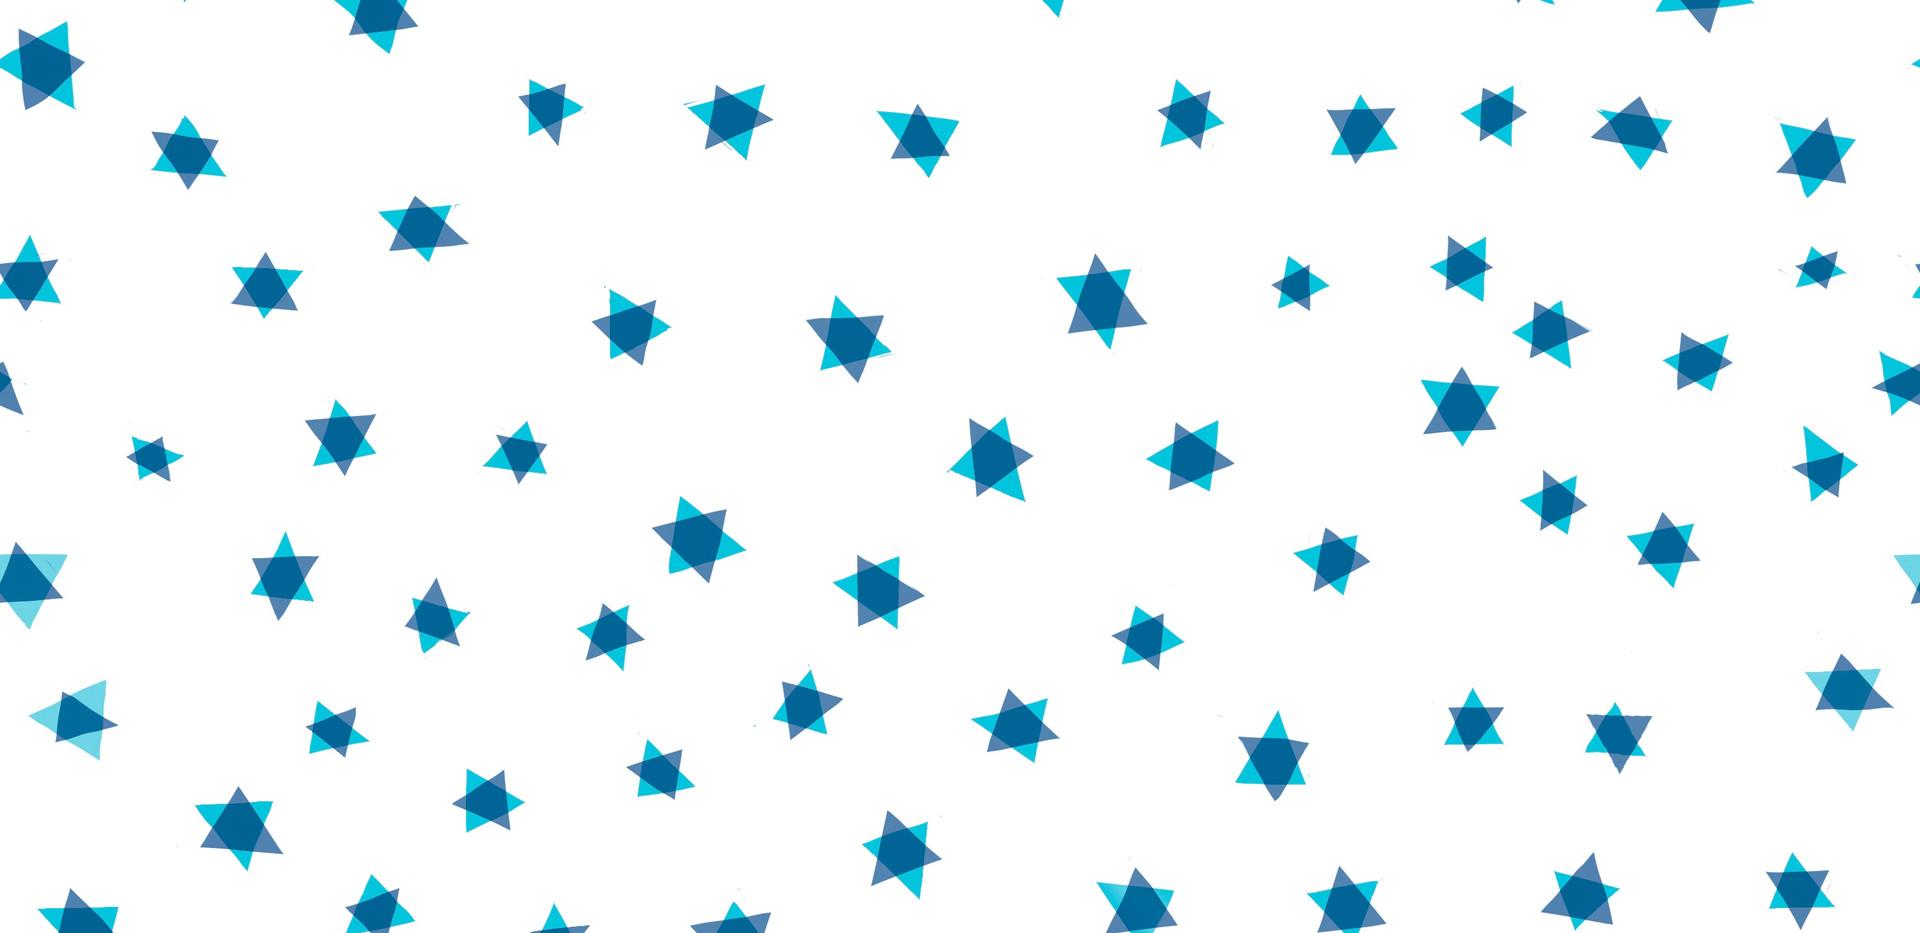 Star Collage Pattern